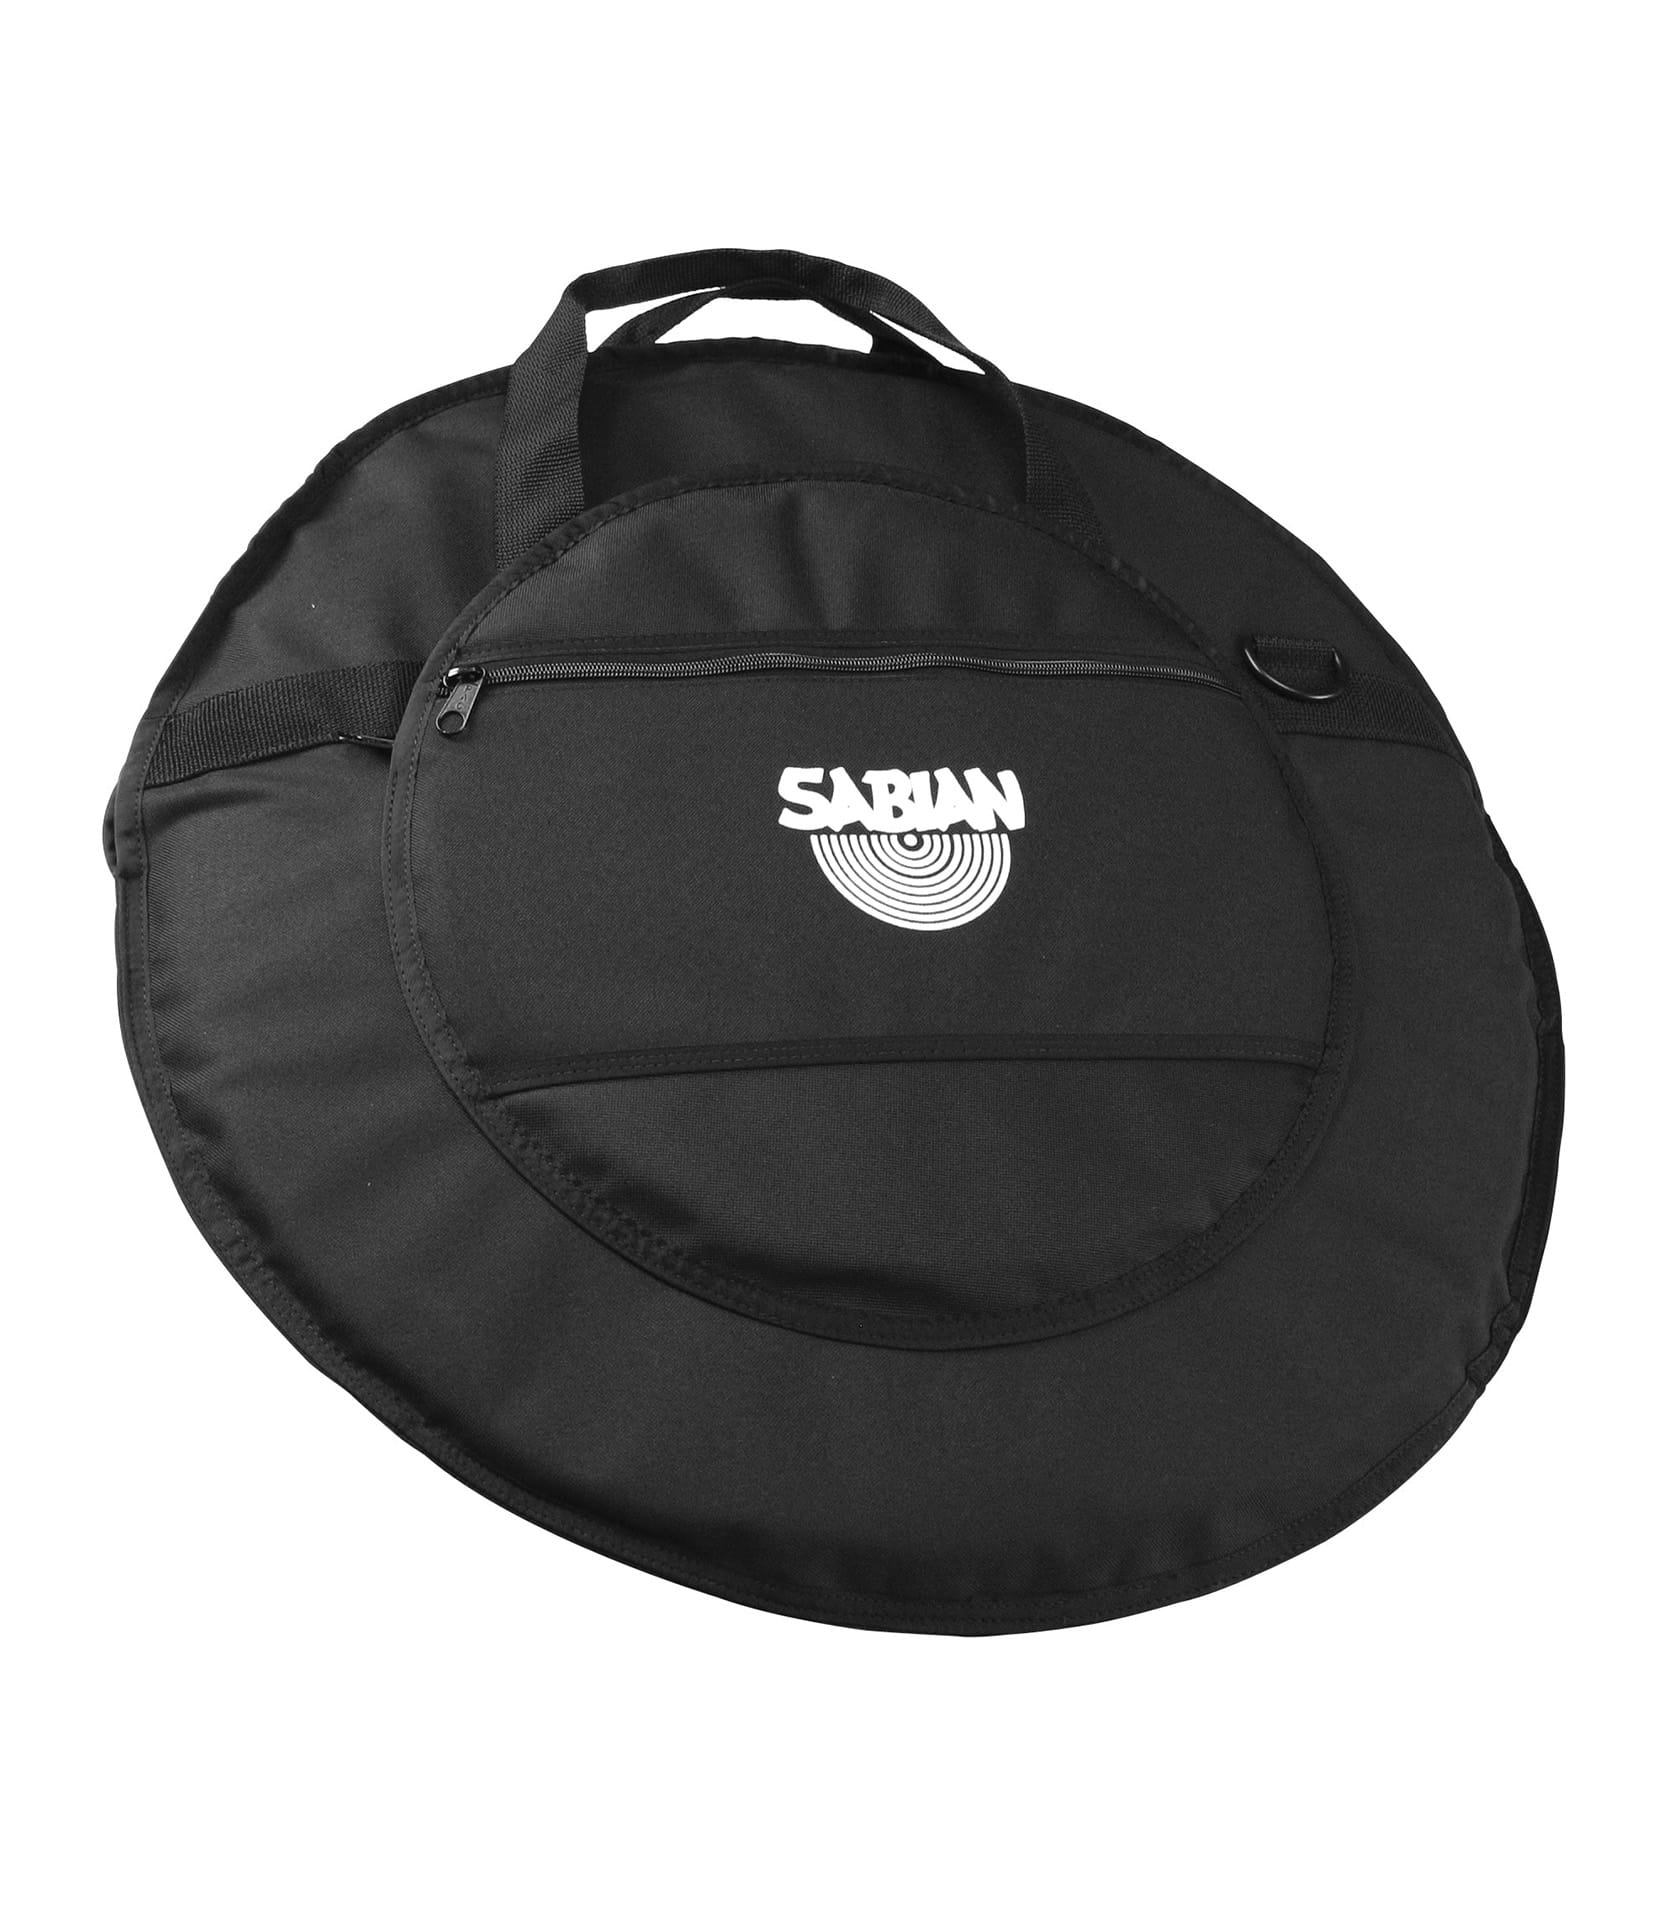 buy sabian 22 inch standard foam padded cymbal bag